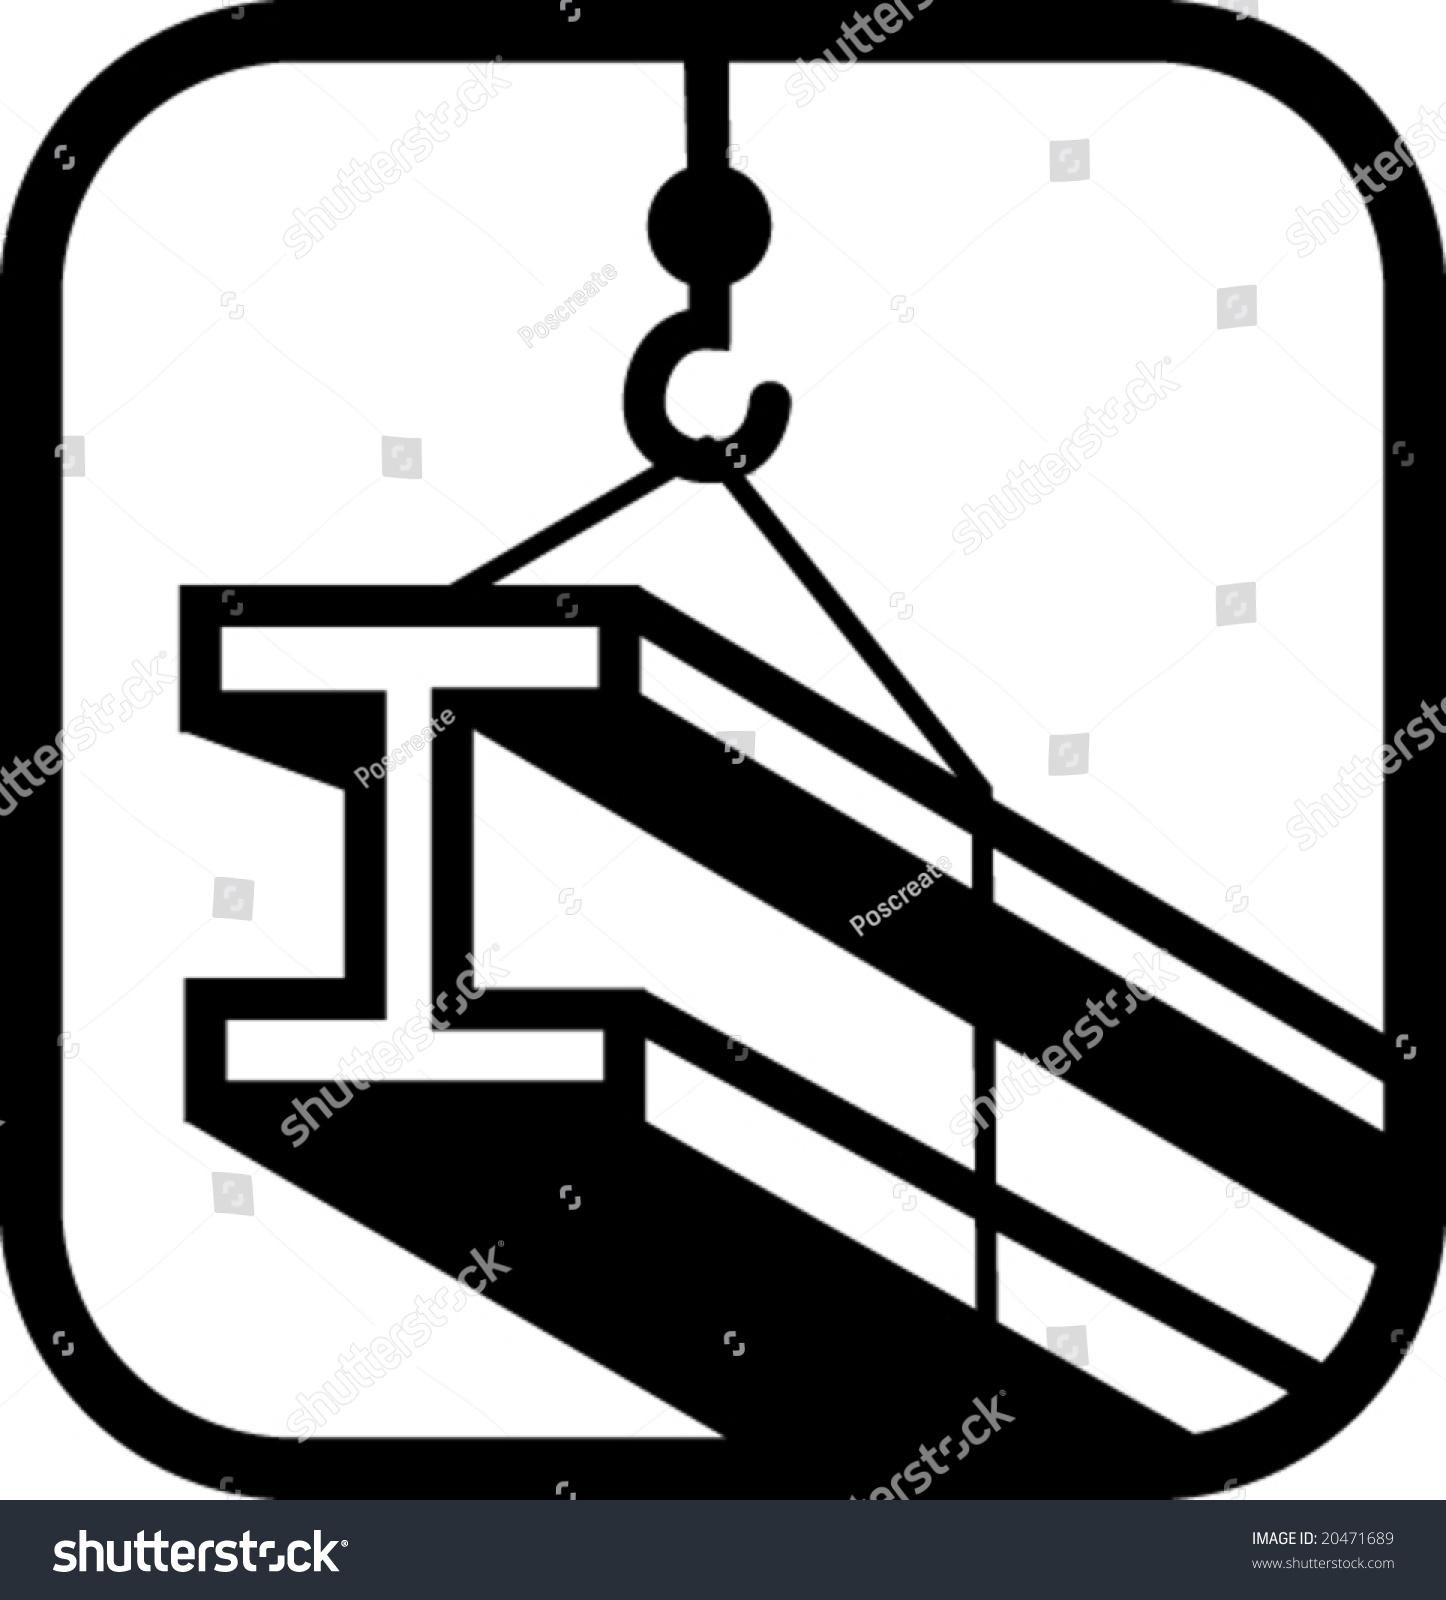 Structural steel logos : Structural steel hoist crane vector stock